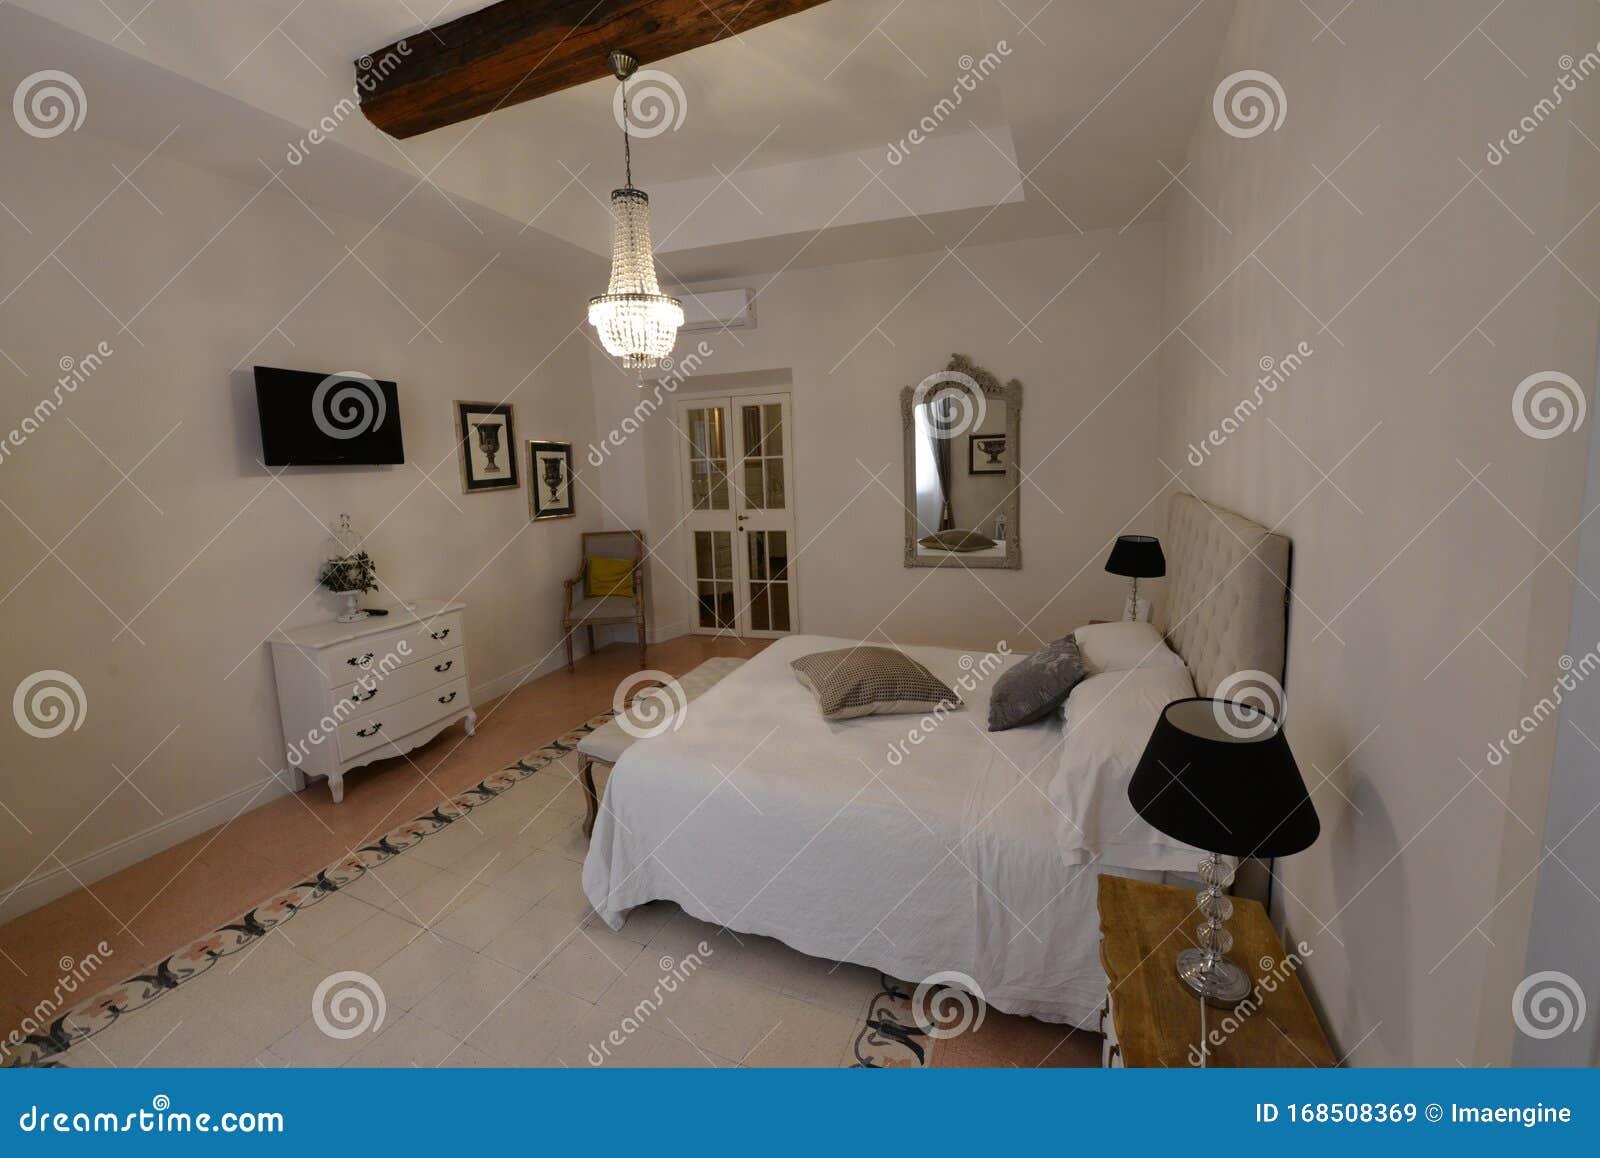 Modern Yet Minimalistic Bedroom Furniture Stock Image Image Of Minimalistic Bedroom 168508369